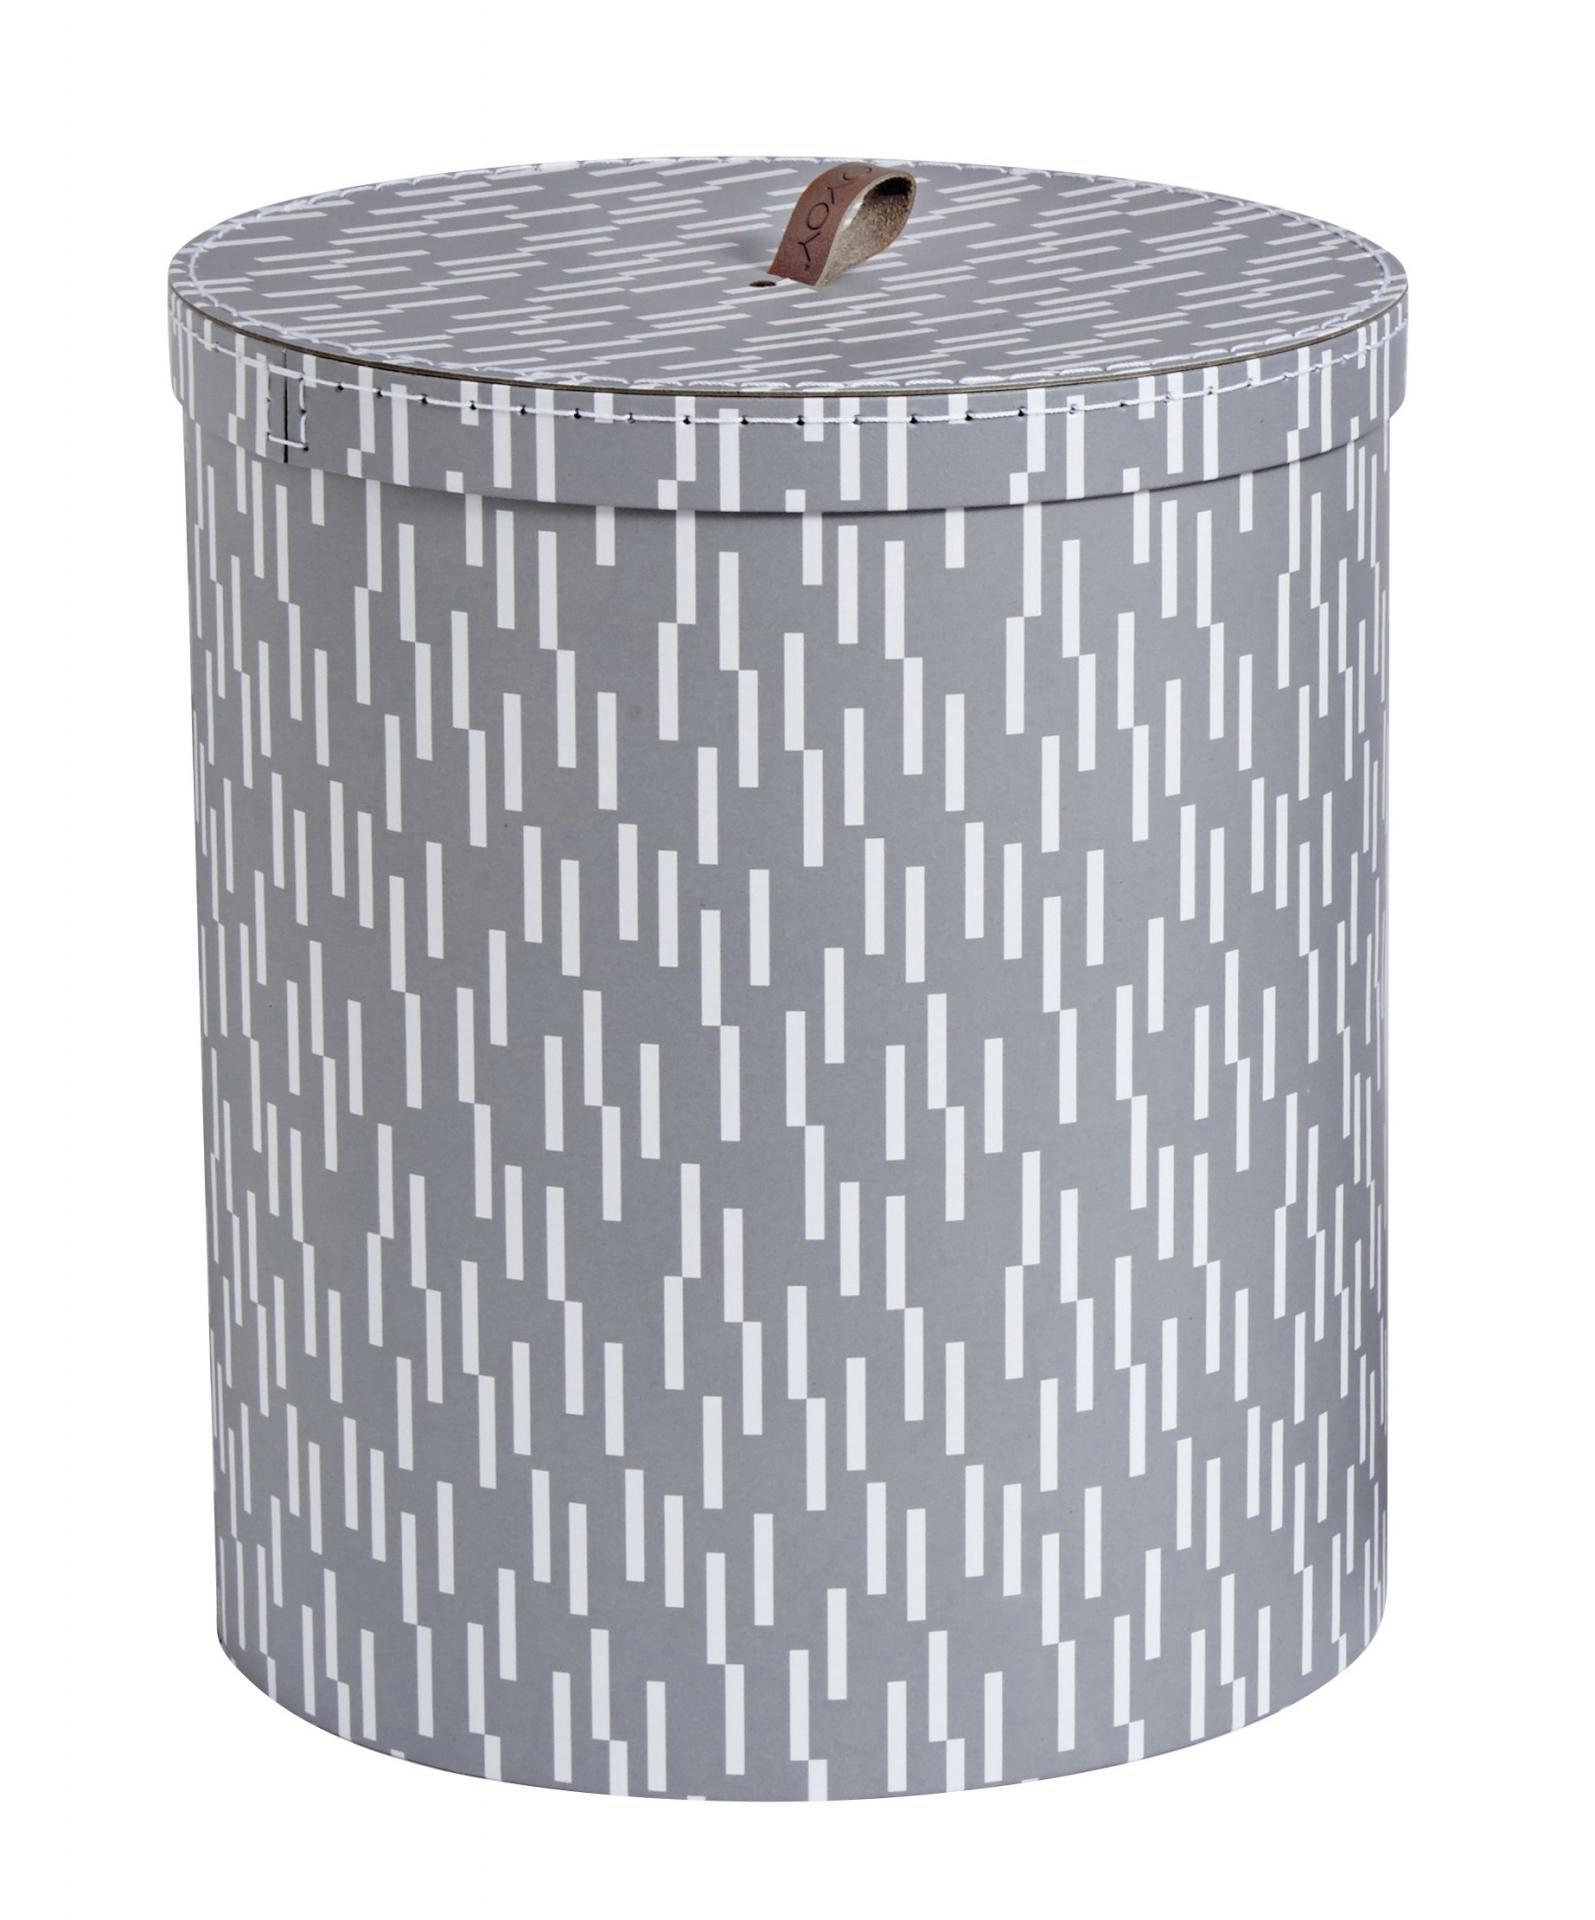 OYOY Kulatý úložný box Dash Grey, šedá barva, papír, kůže